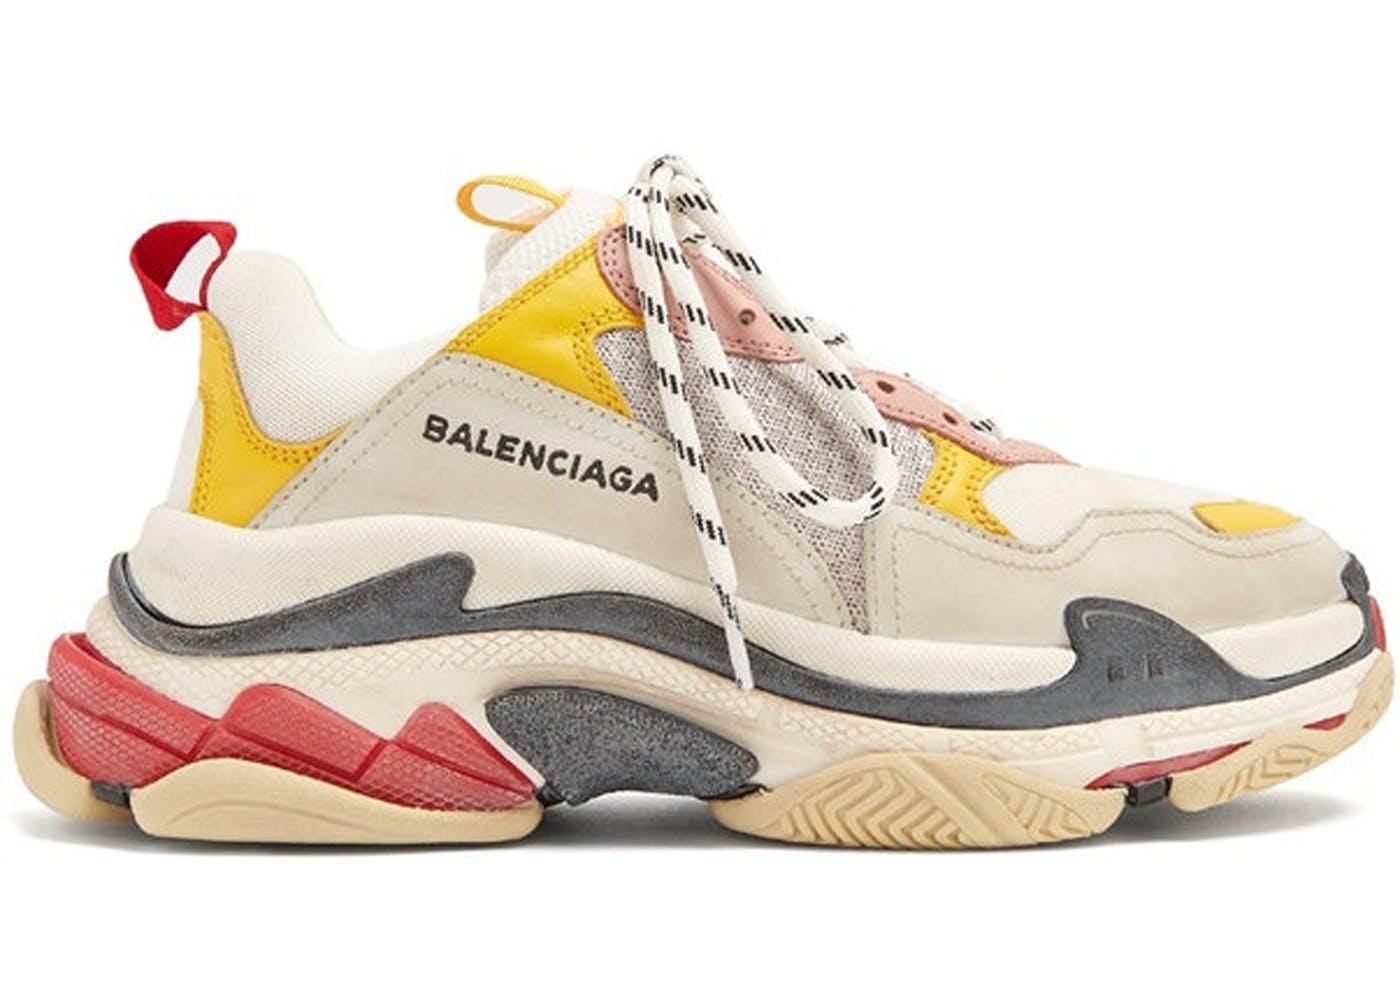 Balenciaga Triple S Cream Yellow Red(バレンシアガトリプルソールクリームイエローレッド) クリーム/イエロー-レッド